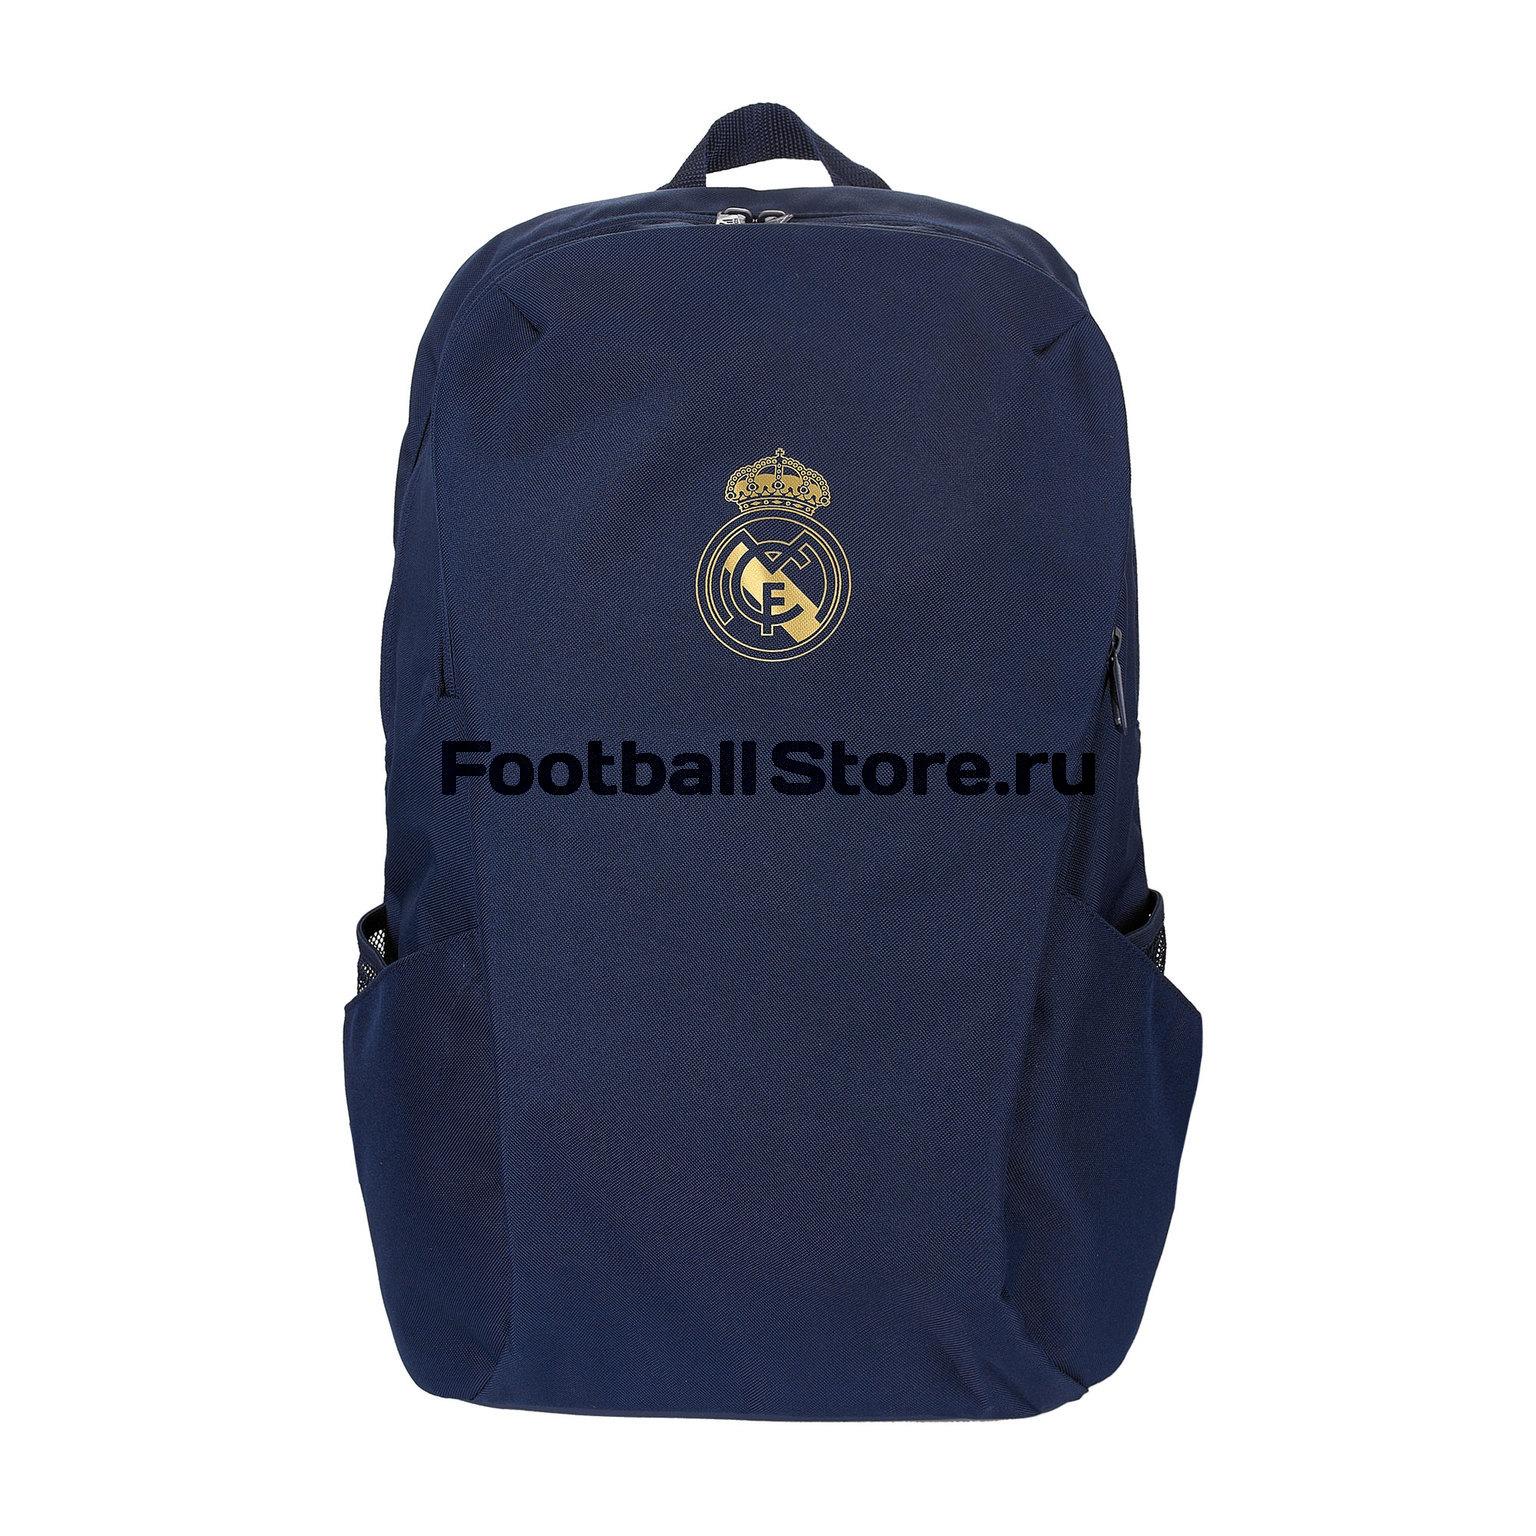 Рюкзак Adidas Real Madrid DY7712 цена